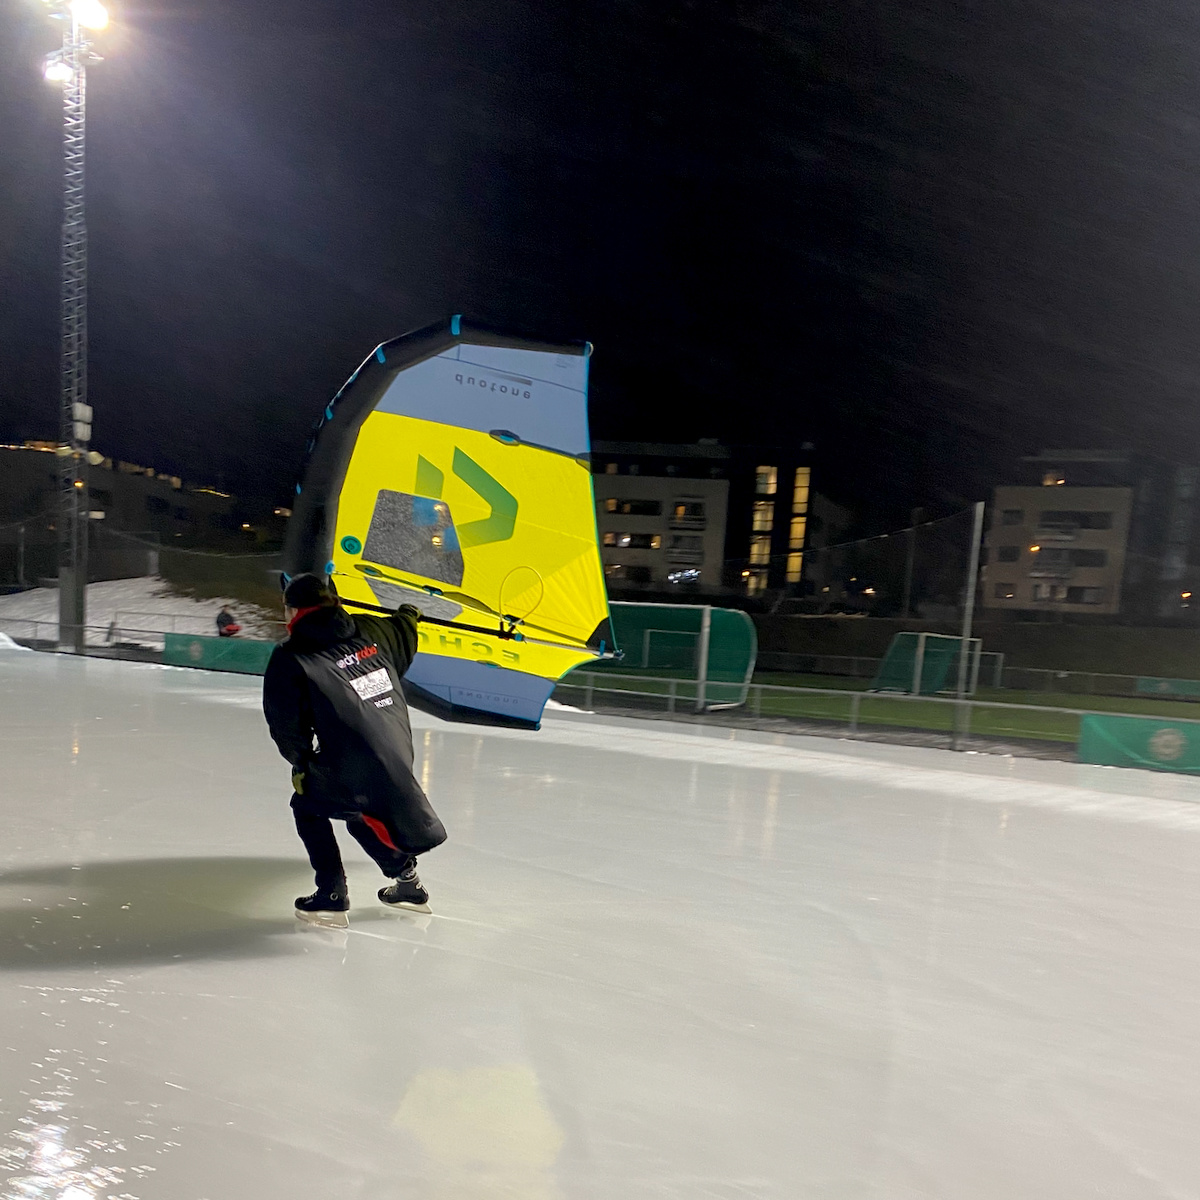 Wingfoil ice skate